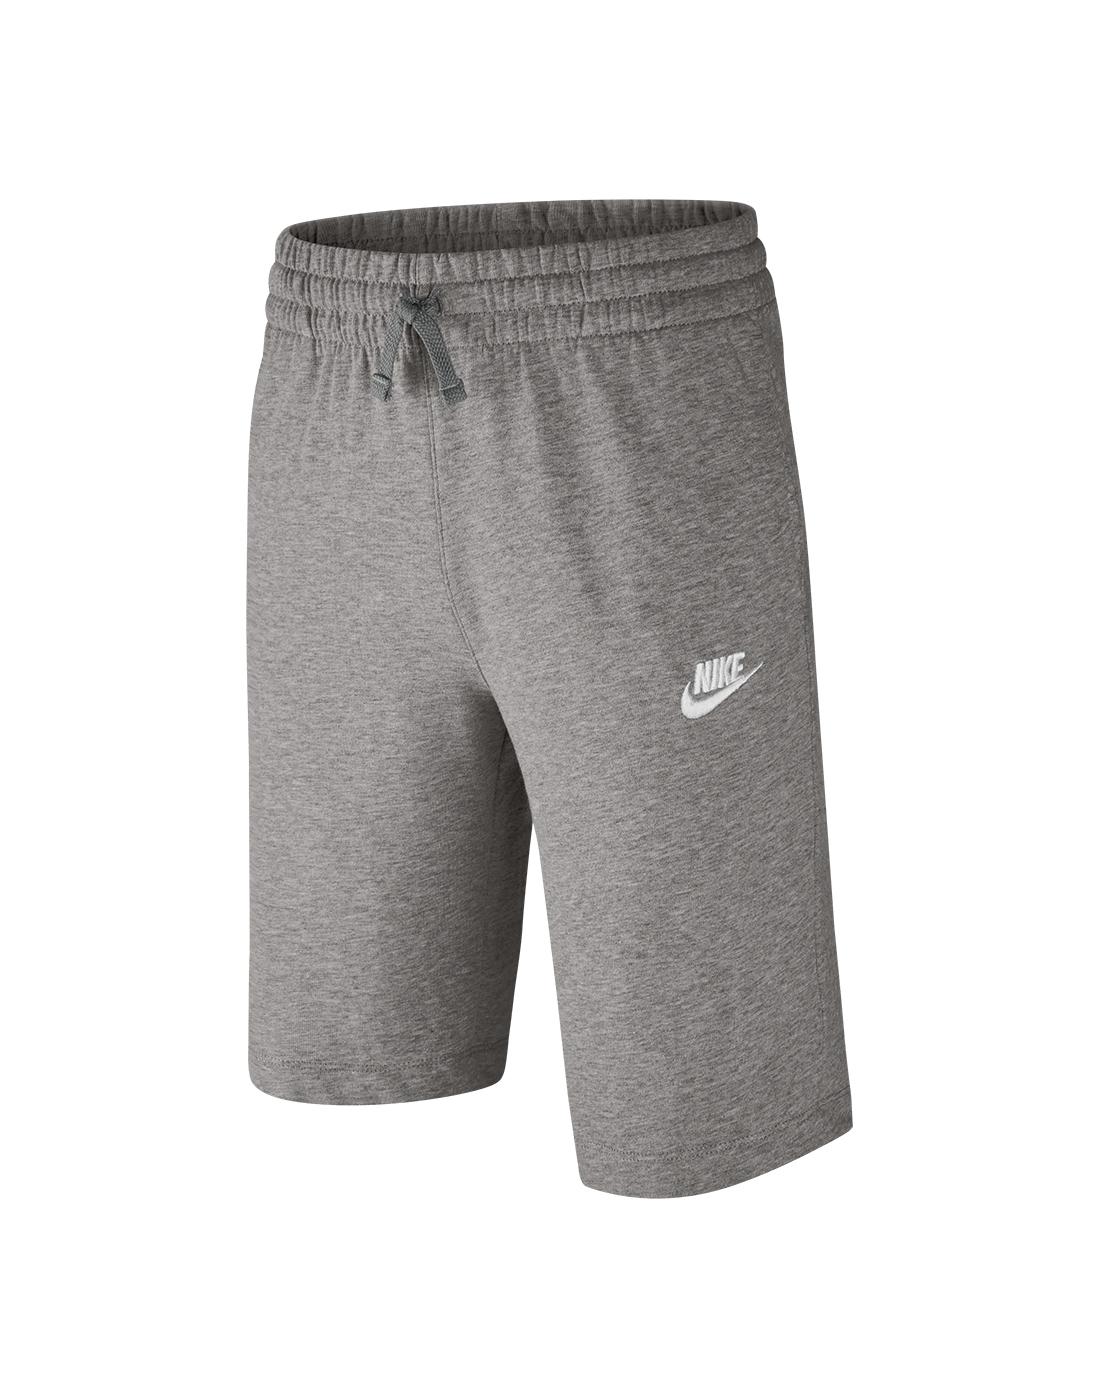 d6a95297c5 Nike Older Boys Jersey Short